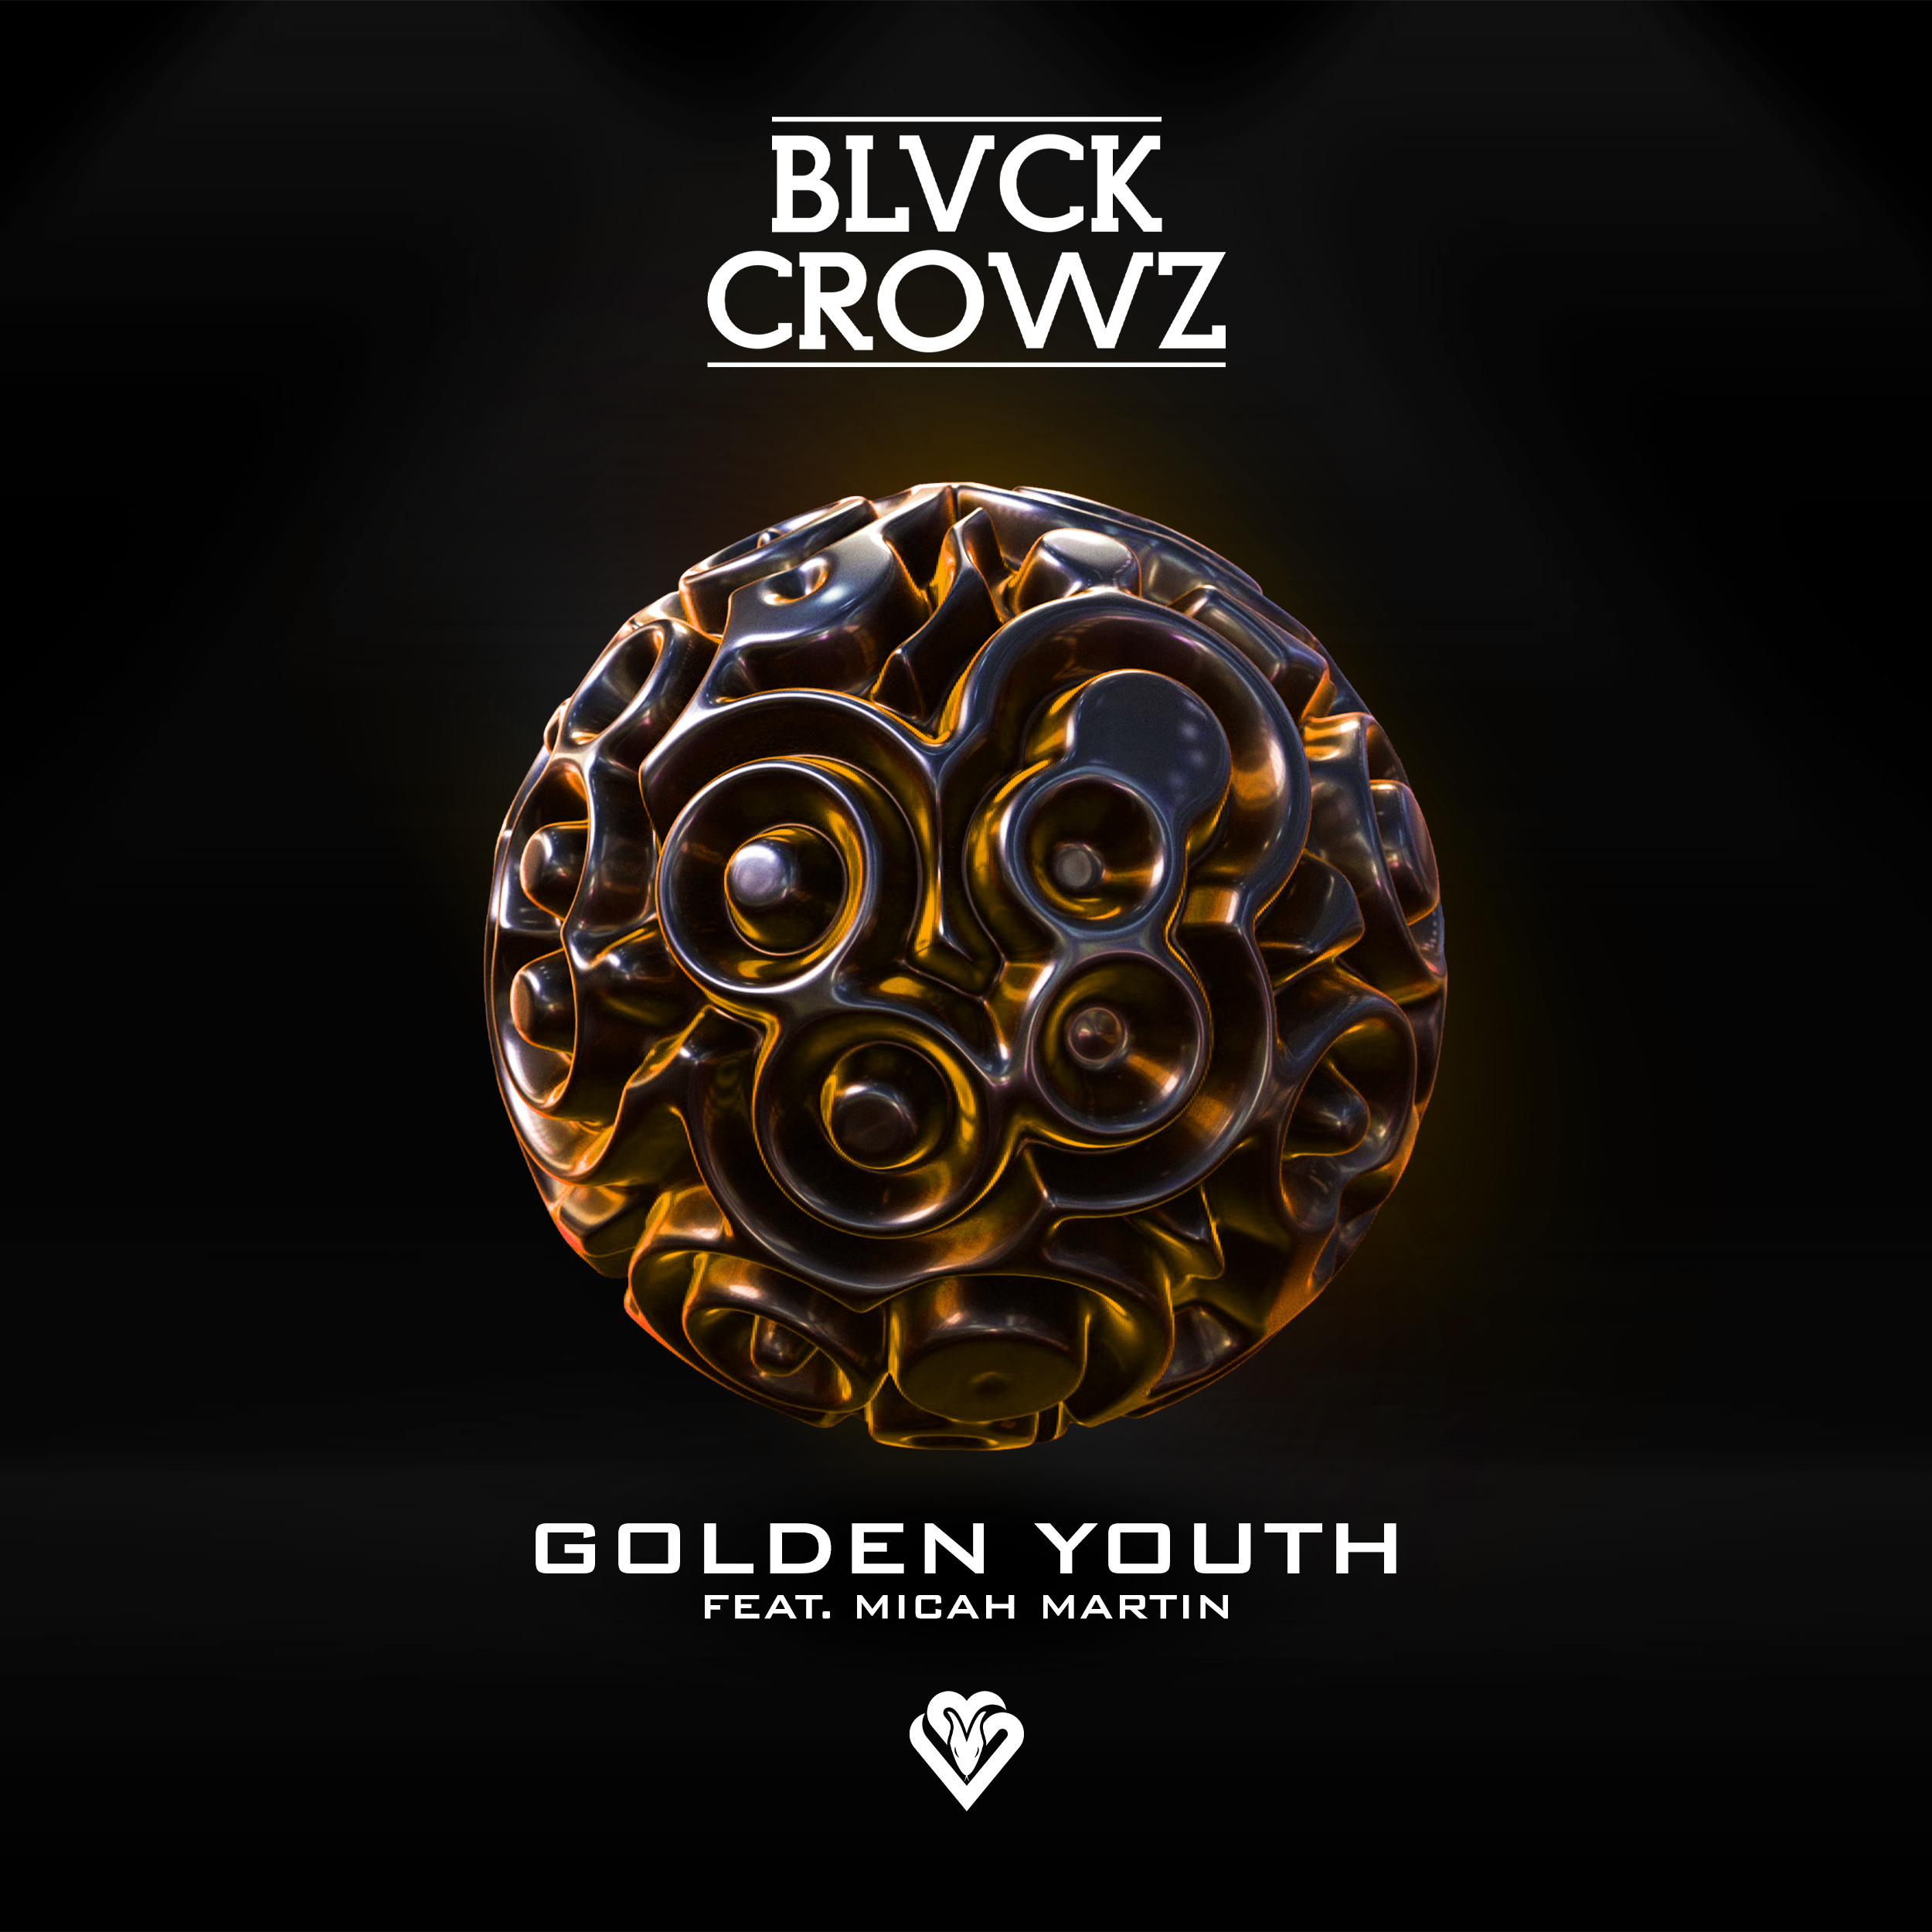 BLVCK CROWZ - Golden Youth feat. Micah Martin [VPR232]